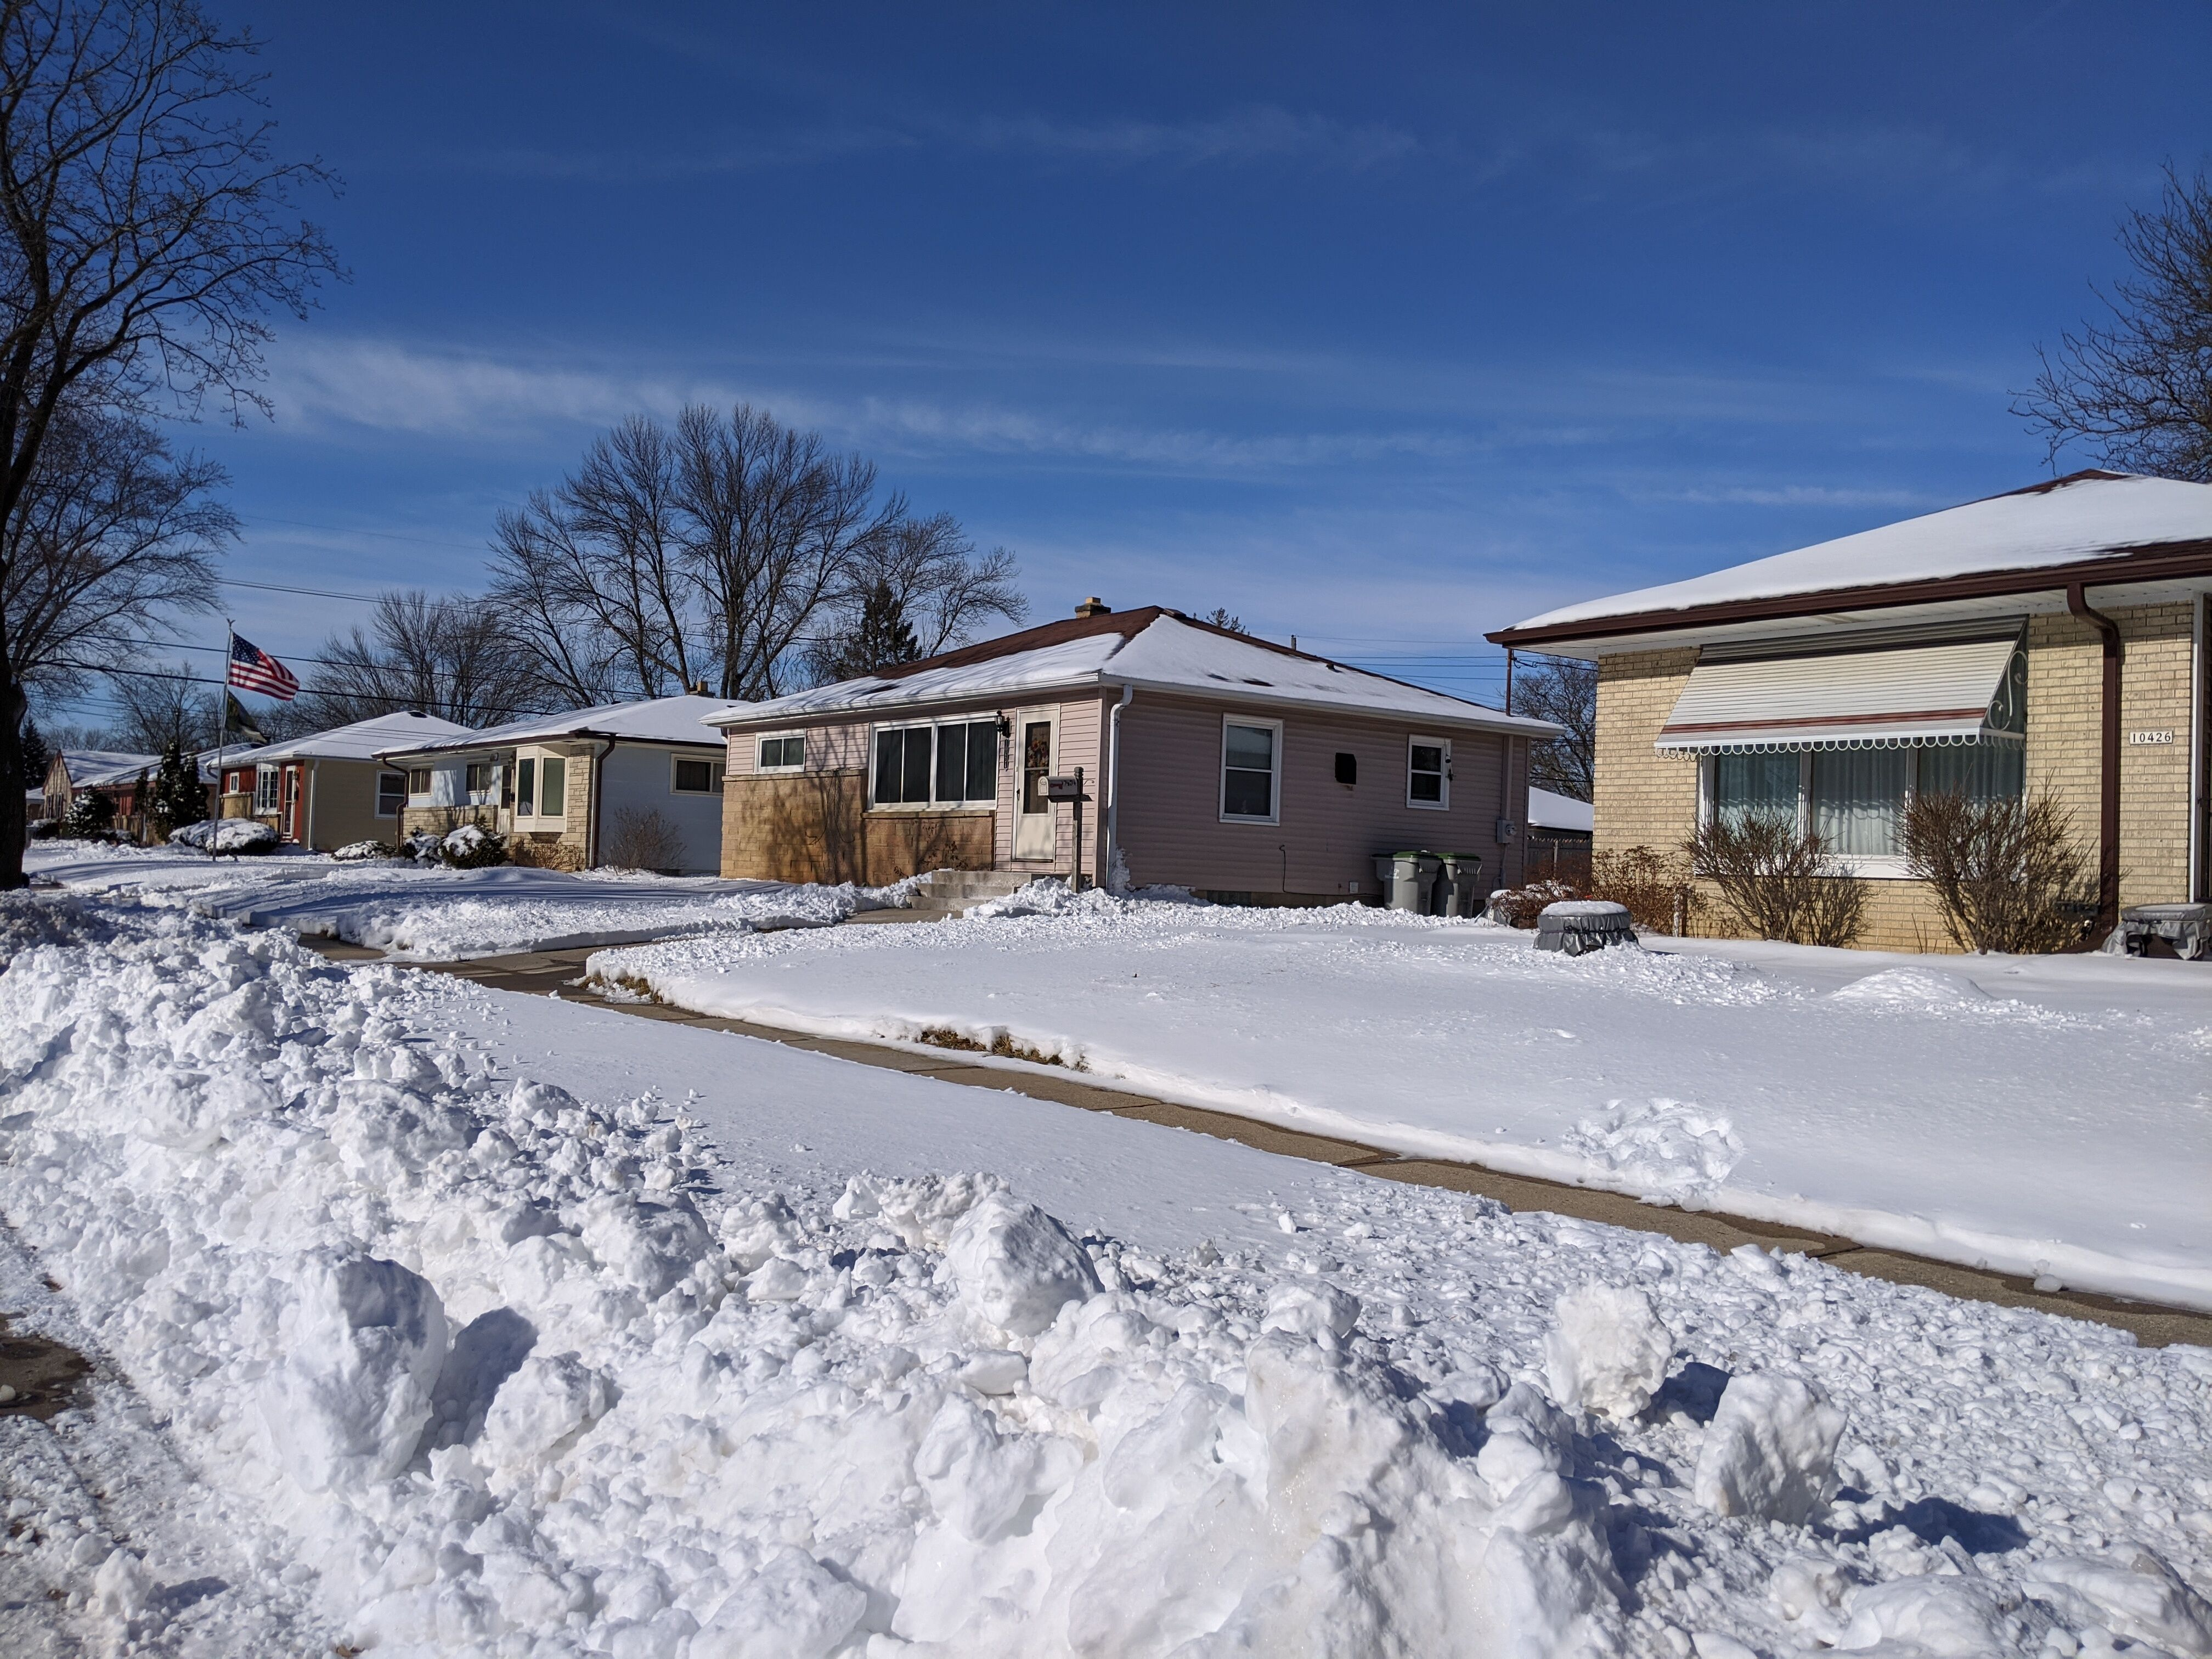 Homes along Custer Avenue. Photo by Carl Baehr.